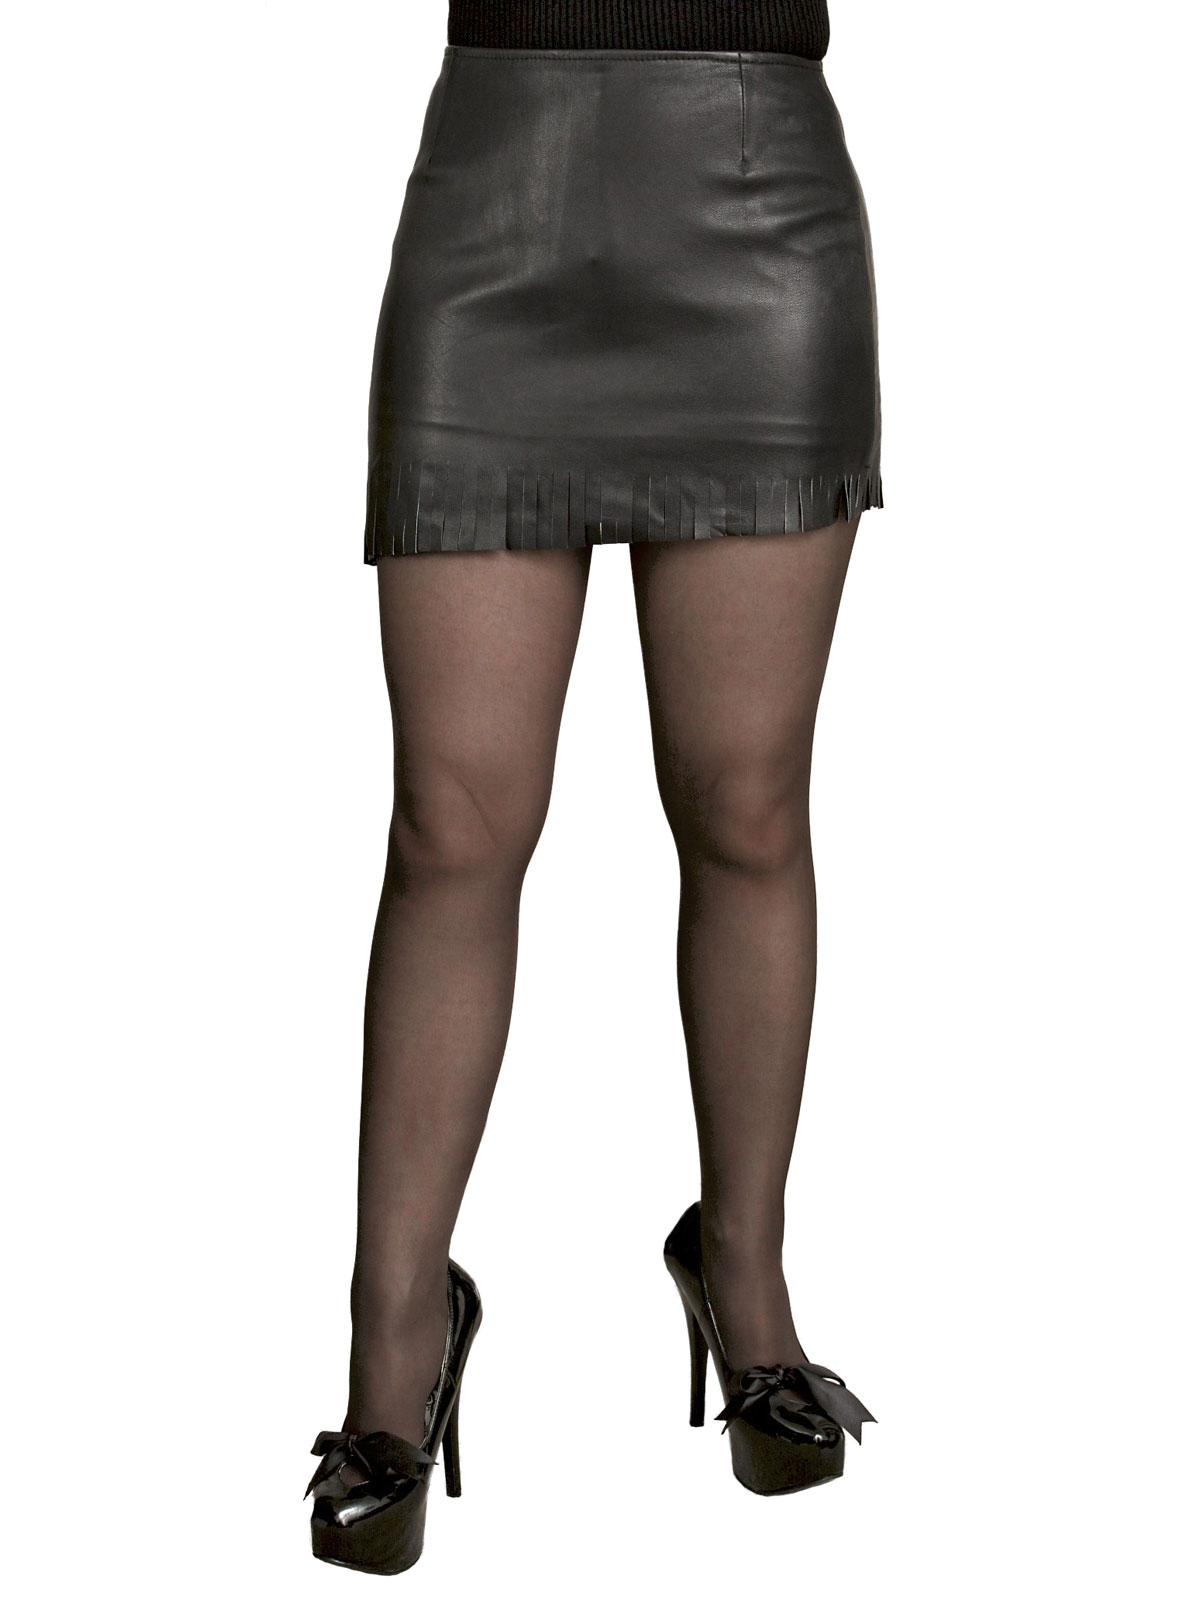 Soft Leather Mini Skirt with Fringed Slant Hem - Tout Ensemble